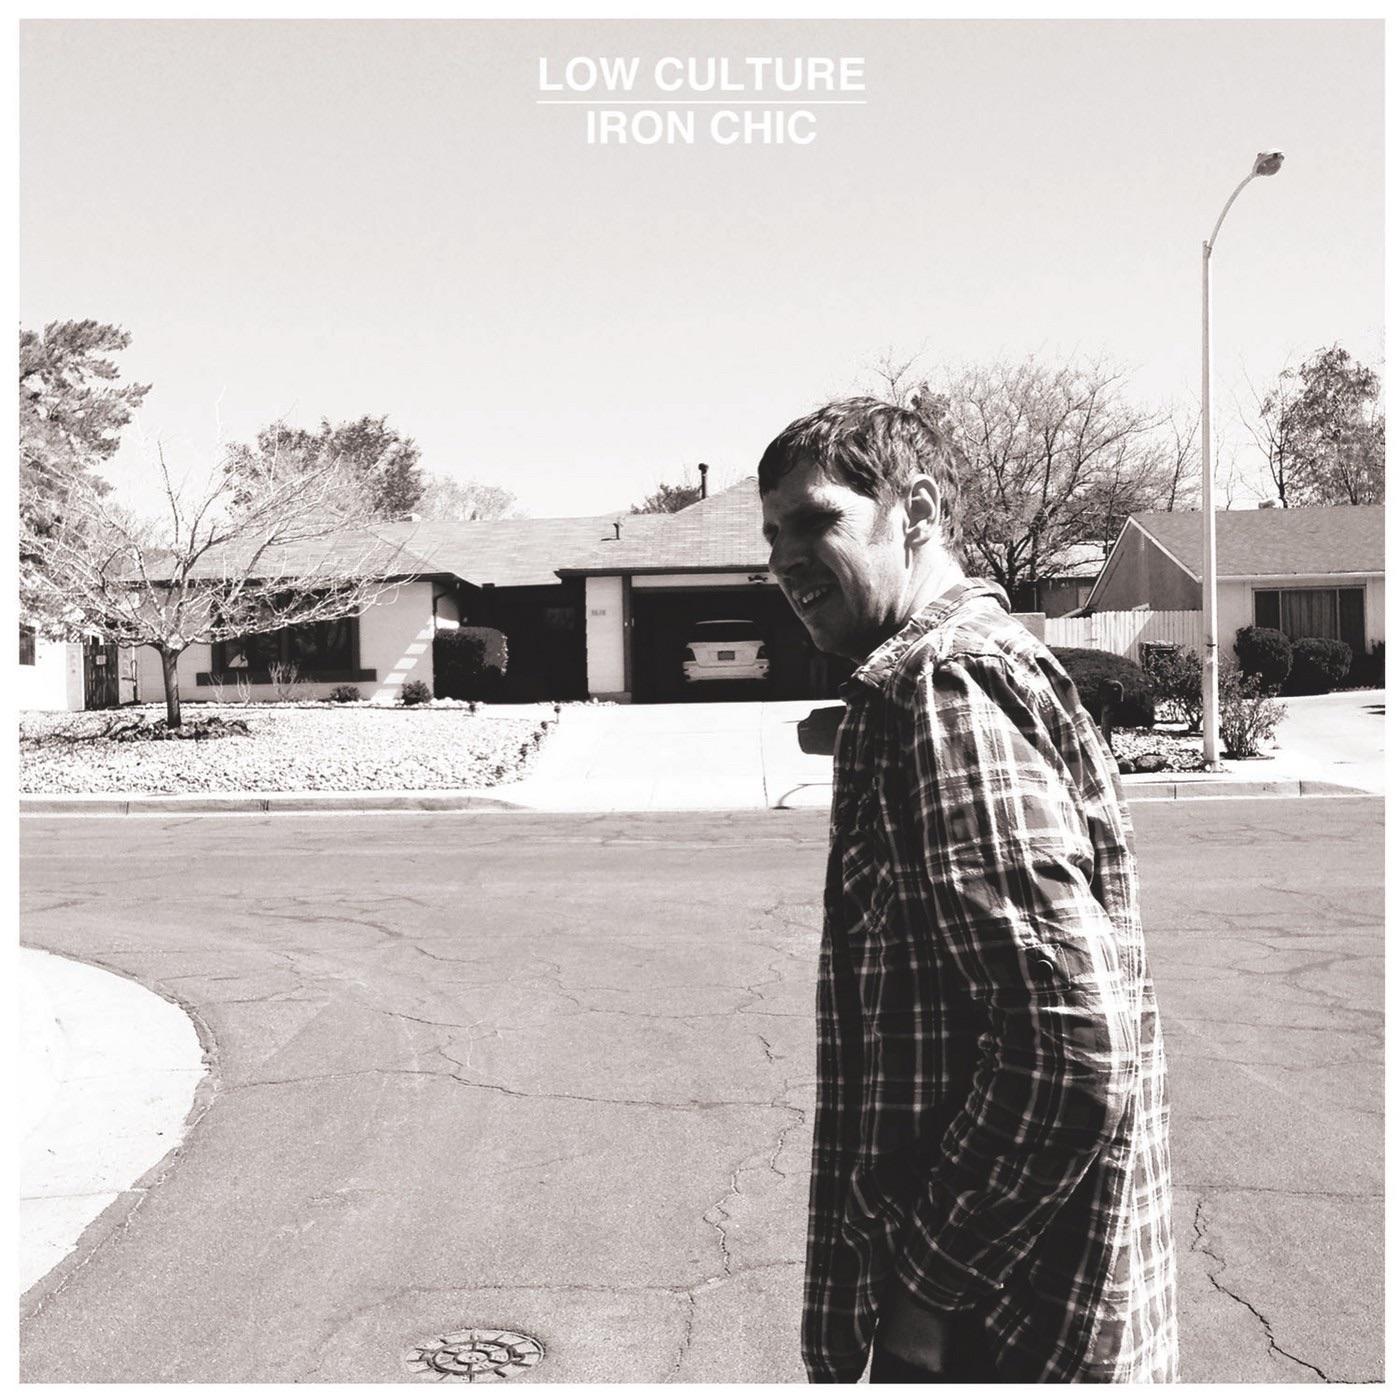 Split (Iron Chic, Low Culture) - EP